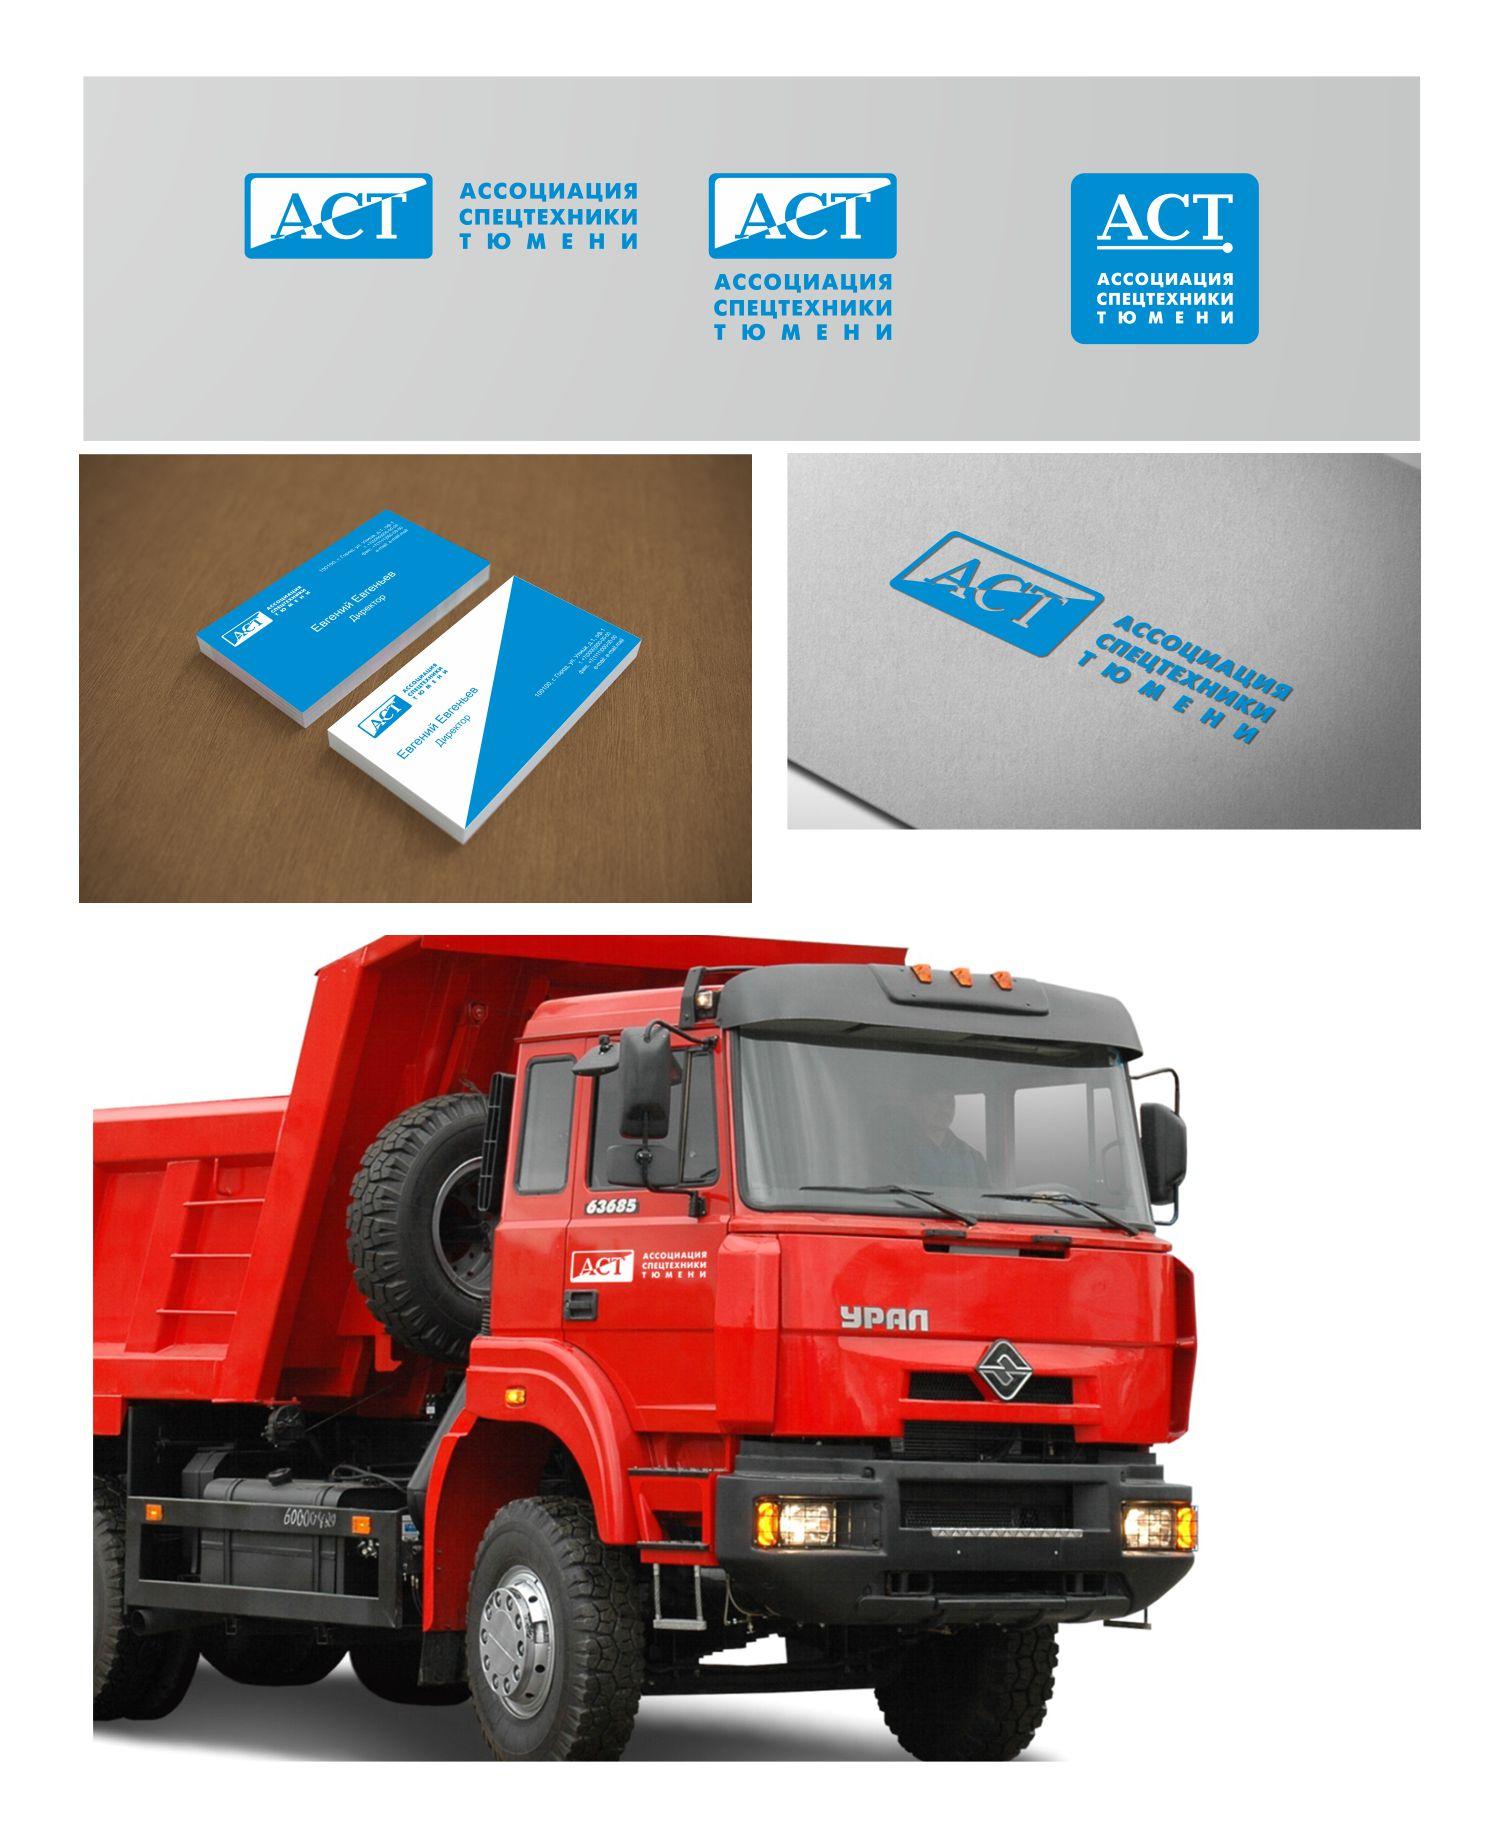 Логотип для Ассоциации спецтехники фото f_525514de2c172015.jpg